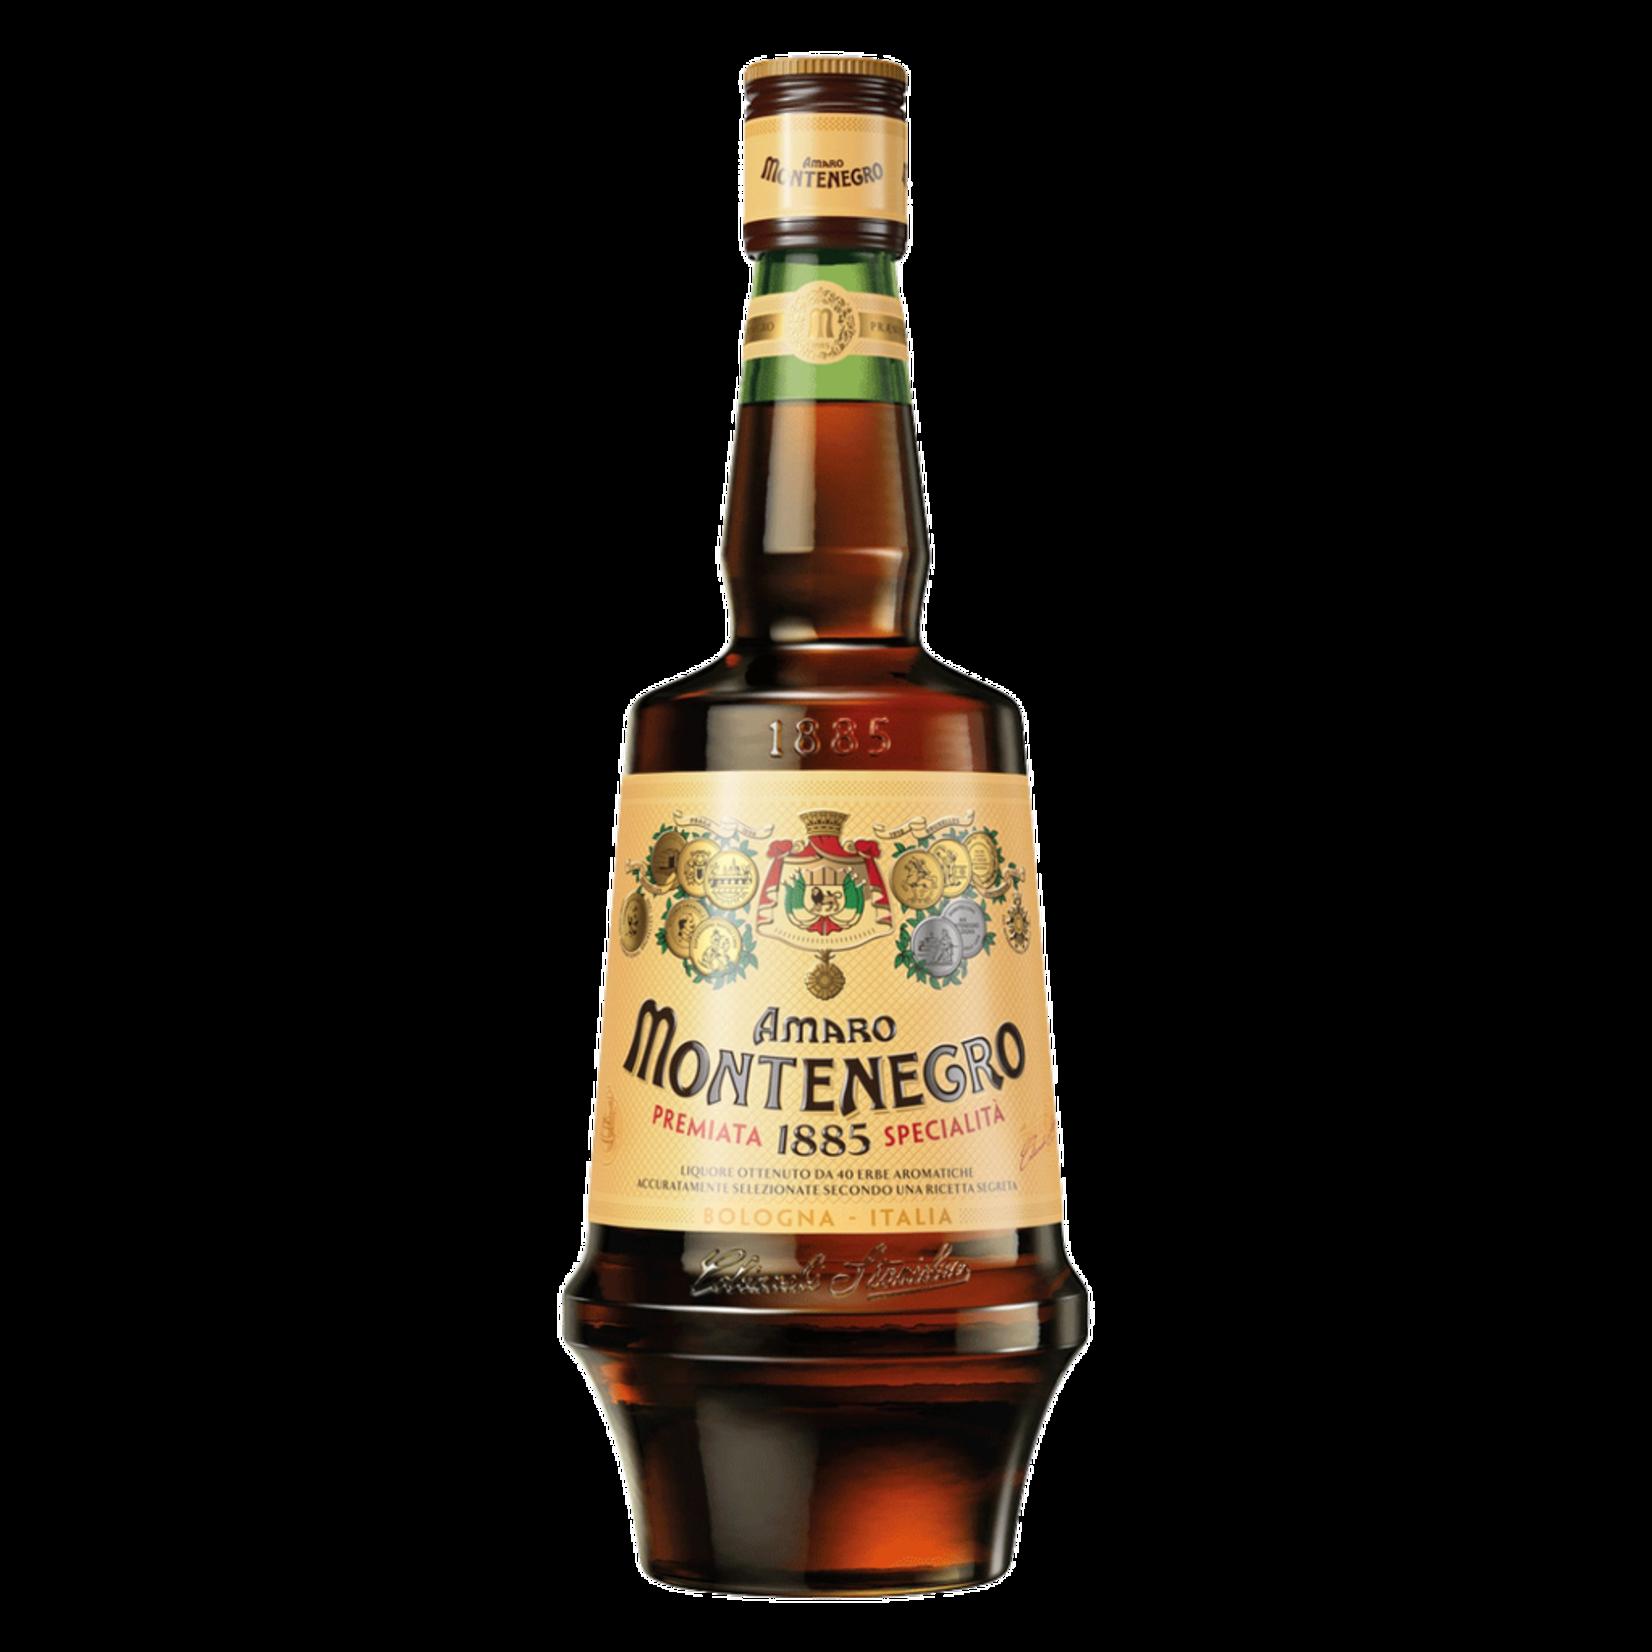 Montenegro Amaro Liquore Italiano